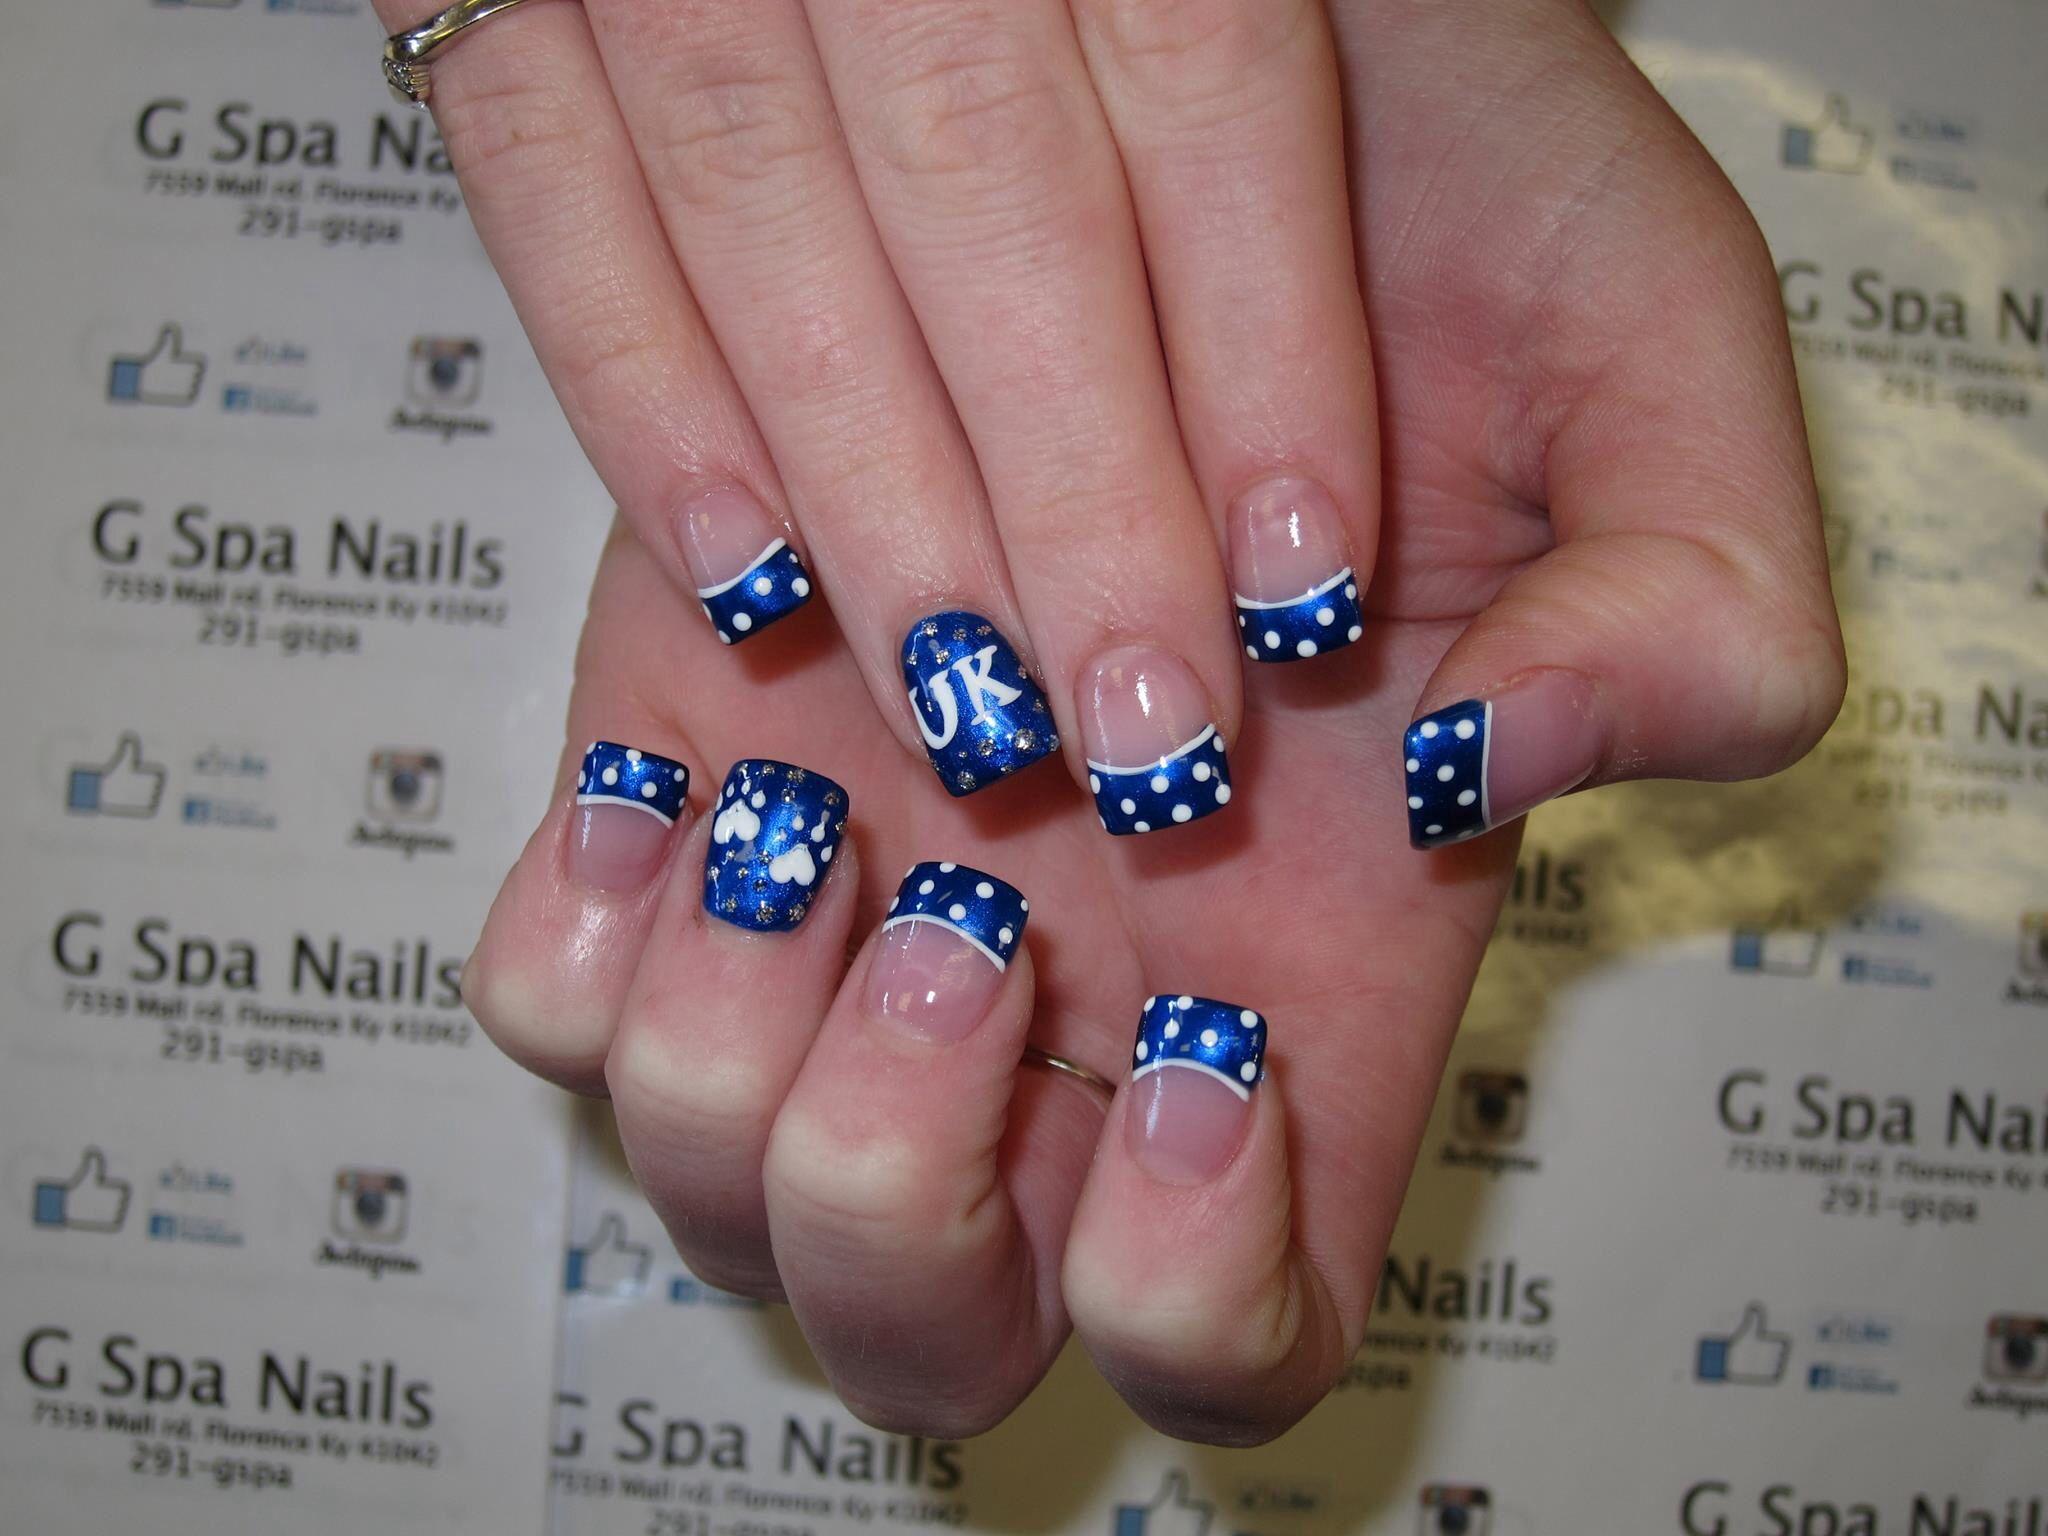 UK nails   Nail designs   Pinterest   Uk nails, Manicure and Makeup